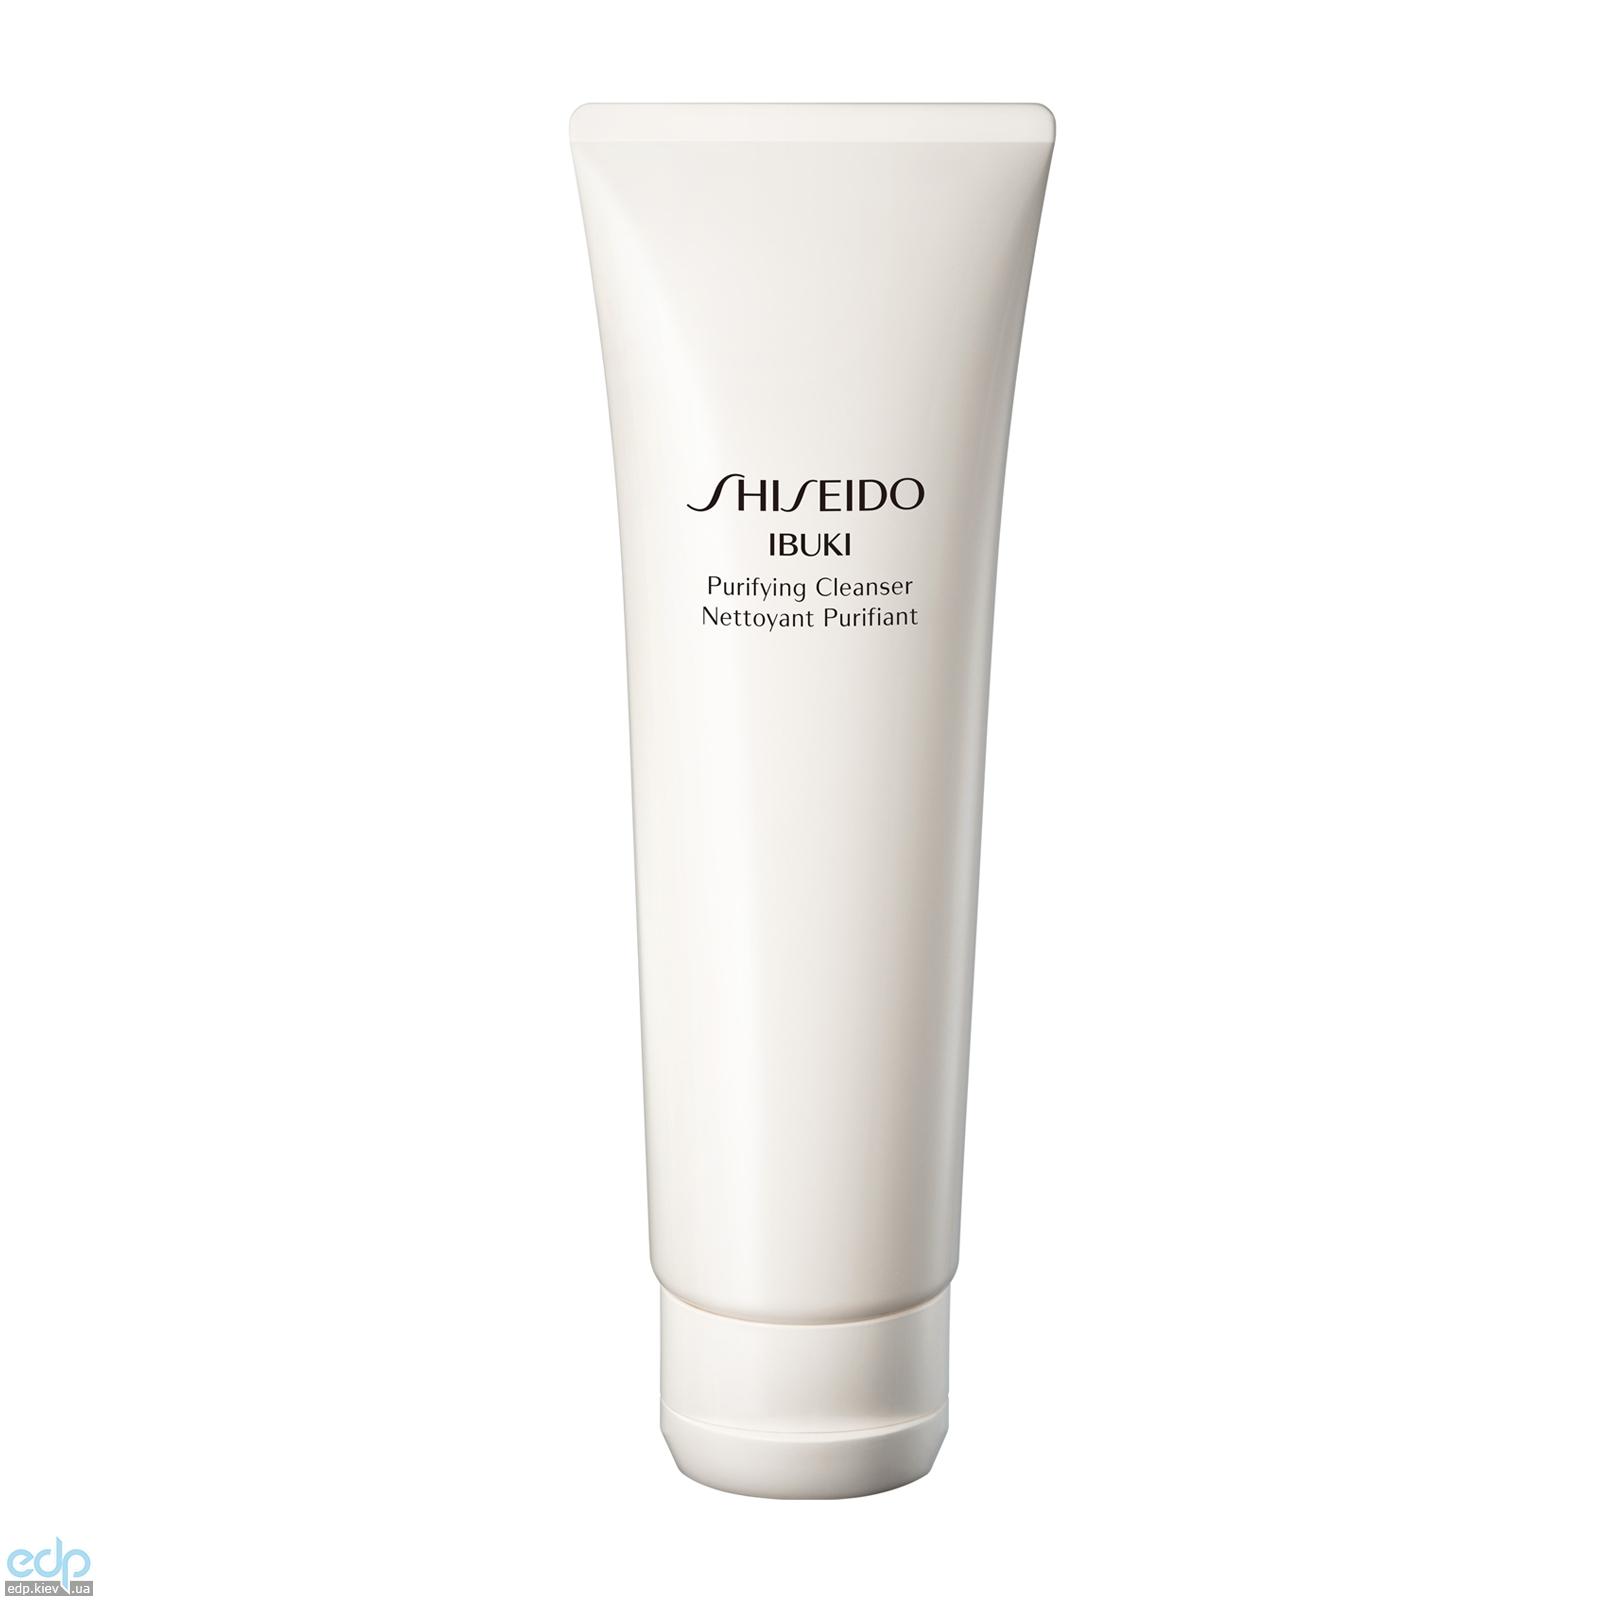 Shiseido - Очищающая пенка-скраб против признаков усталости кожи Ibuki Purifying Cleanser - 125 ml